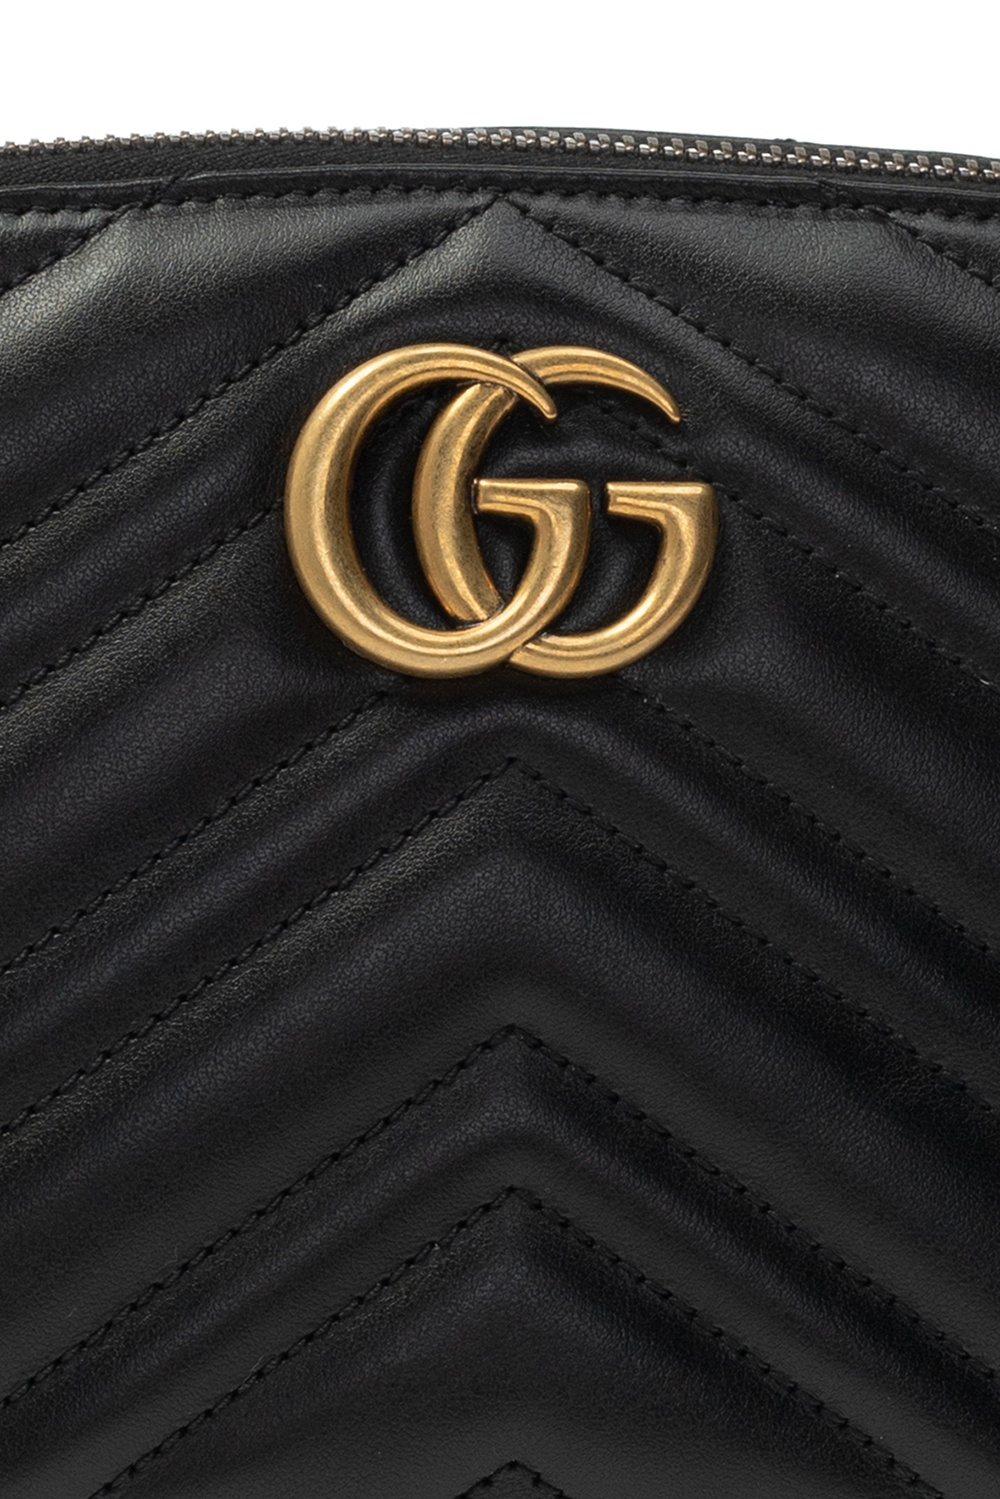 Gucci 'GG Marmont' Logo wash bag